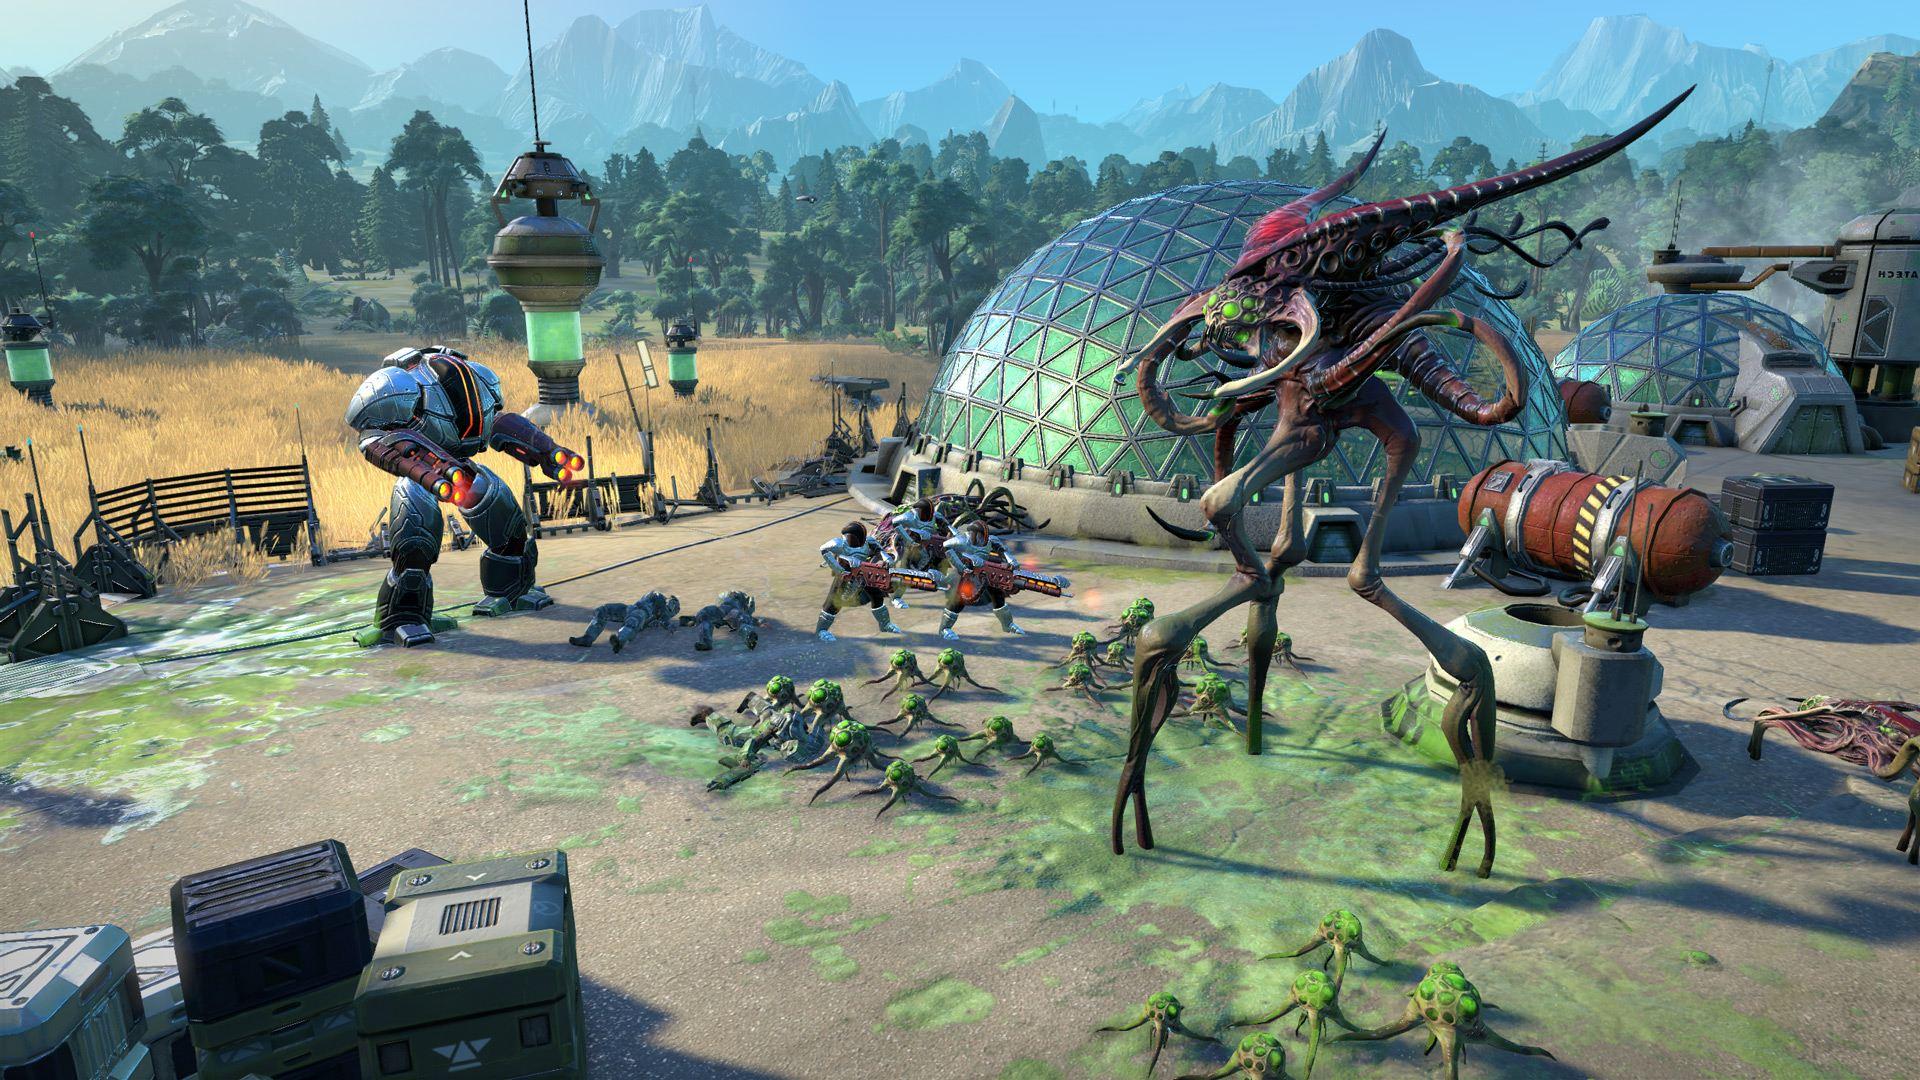 Age of Wonders воплотилась в научно-фантастическом жанре: анонсирована Age of Wonders: Planetfall